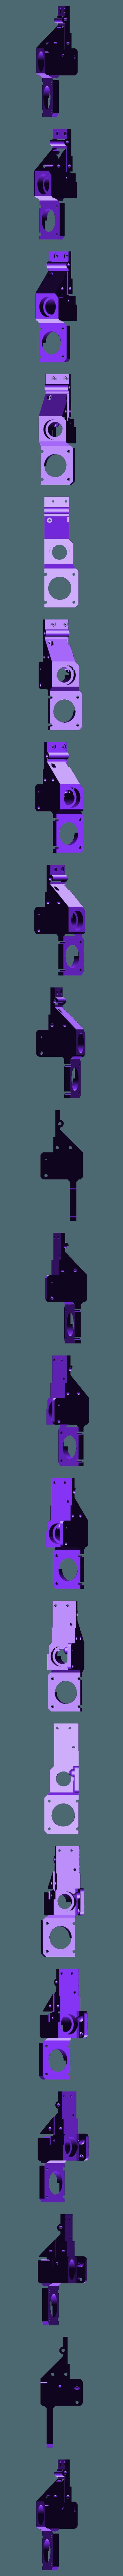 Geared_Extrude_main_body.stl Download free STL file FDM Printer de Kleine Reus 300x300x900 • 3D printable object, Job